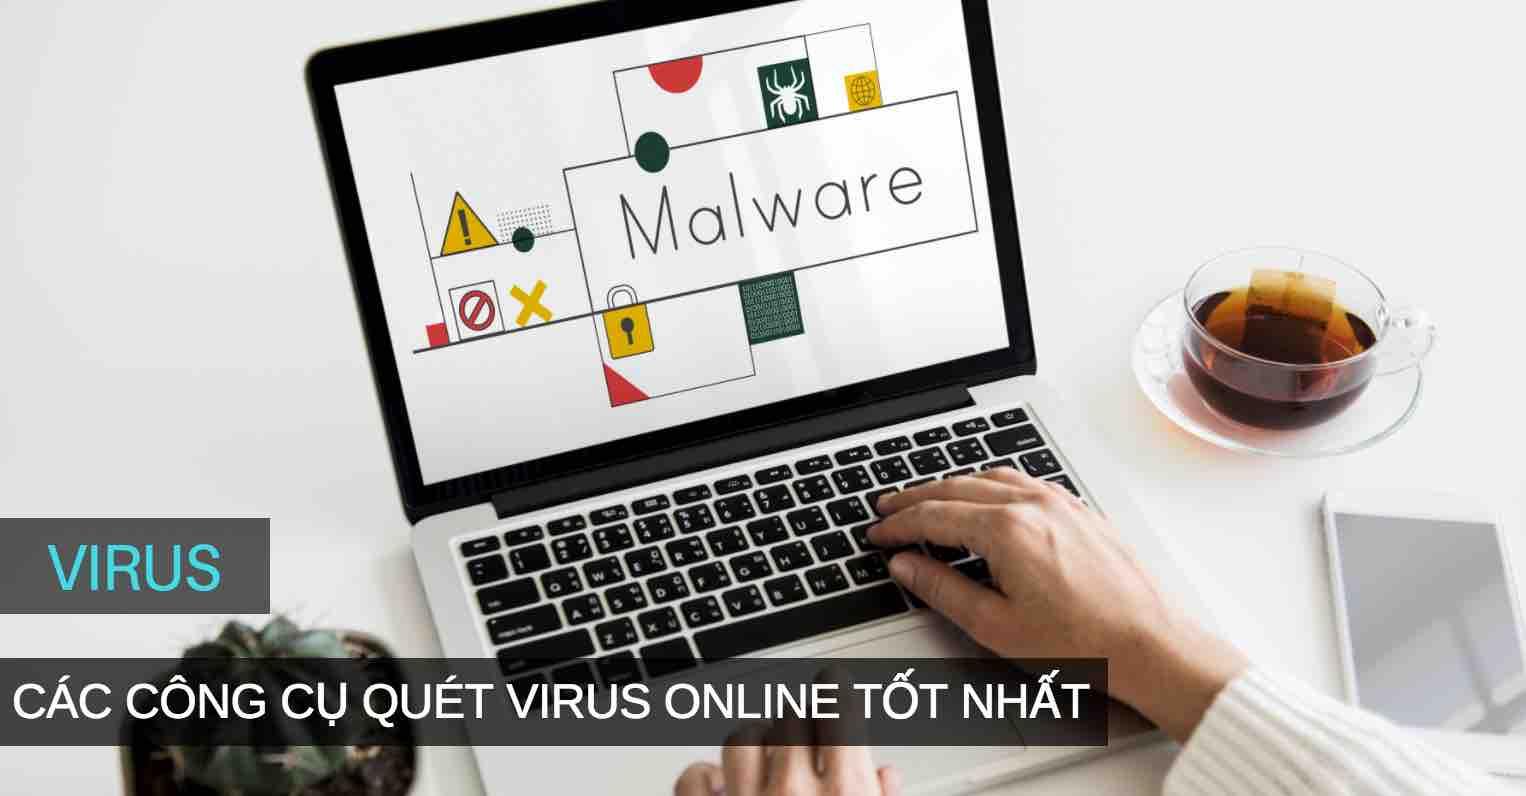 quet_virus_online